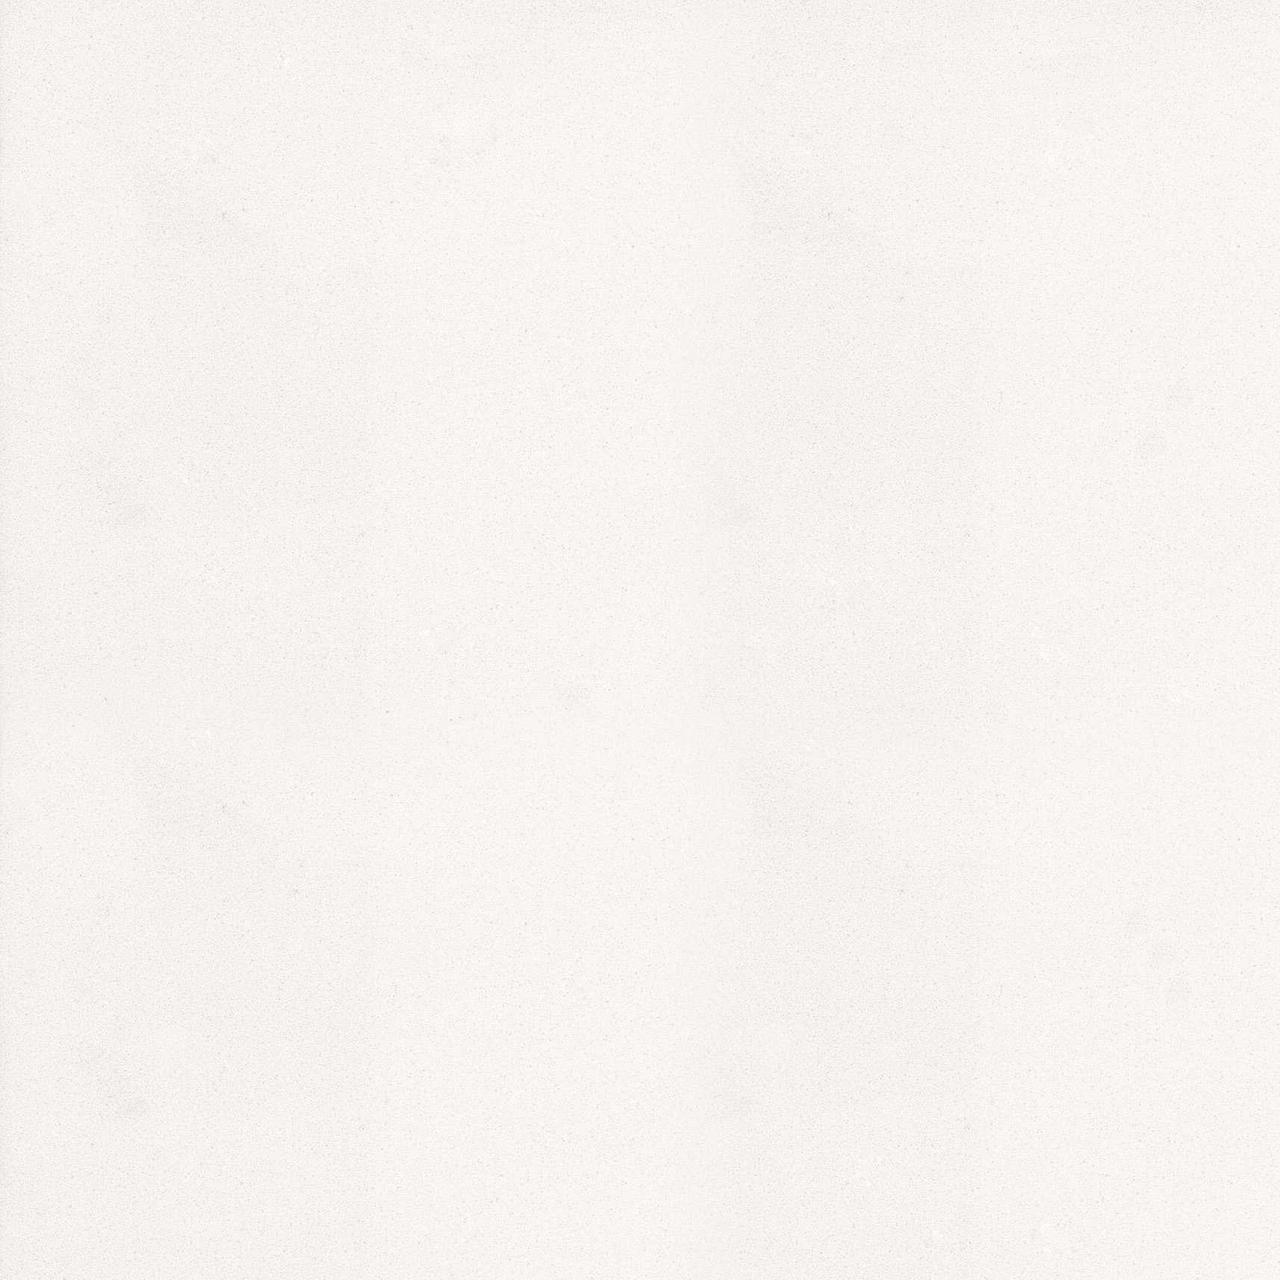 Искусственный камень, Кварц Silestone Blanco Stellar 20 мм